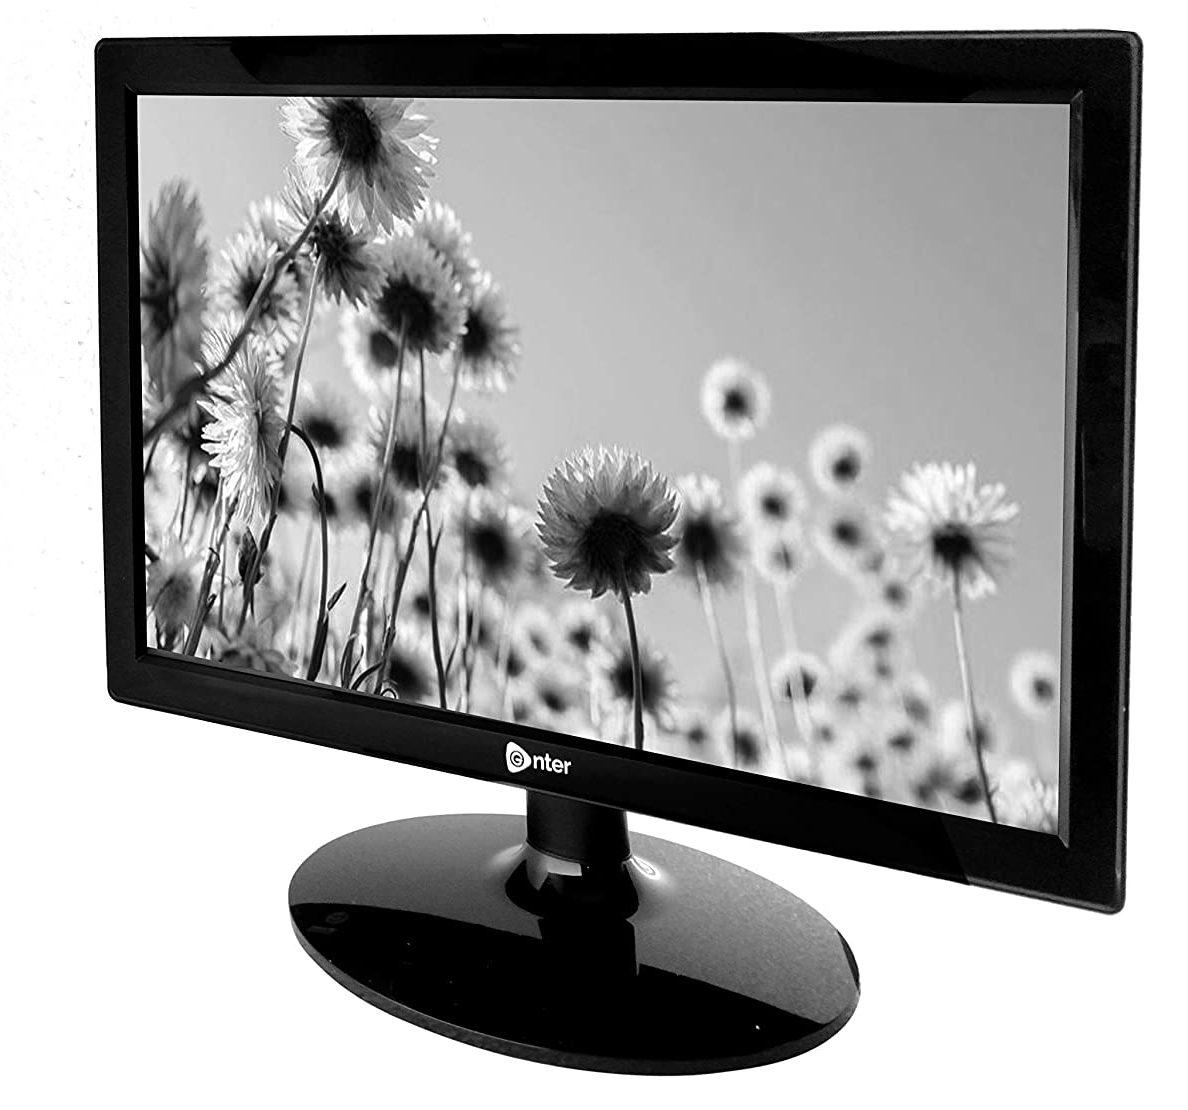 Enter HD LED Backlit Monitor with HDMI & VGA